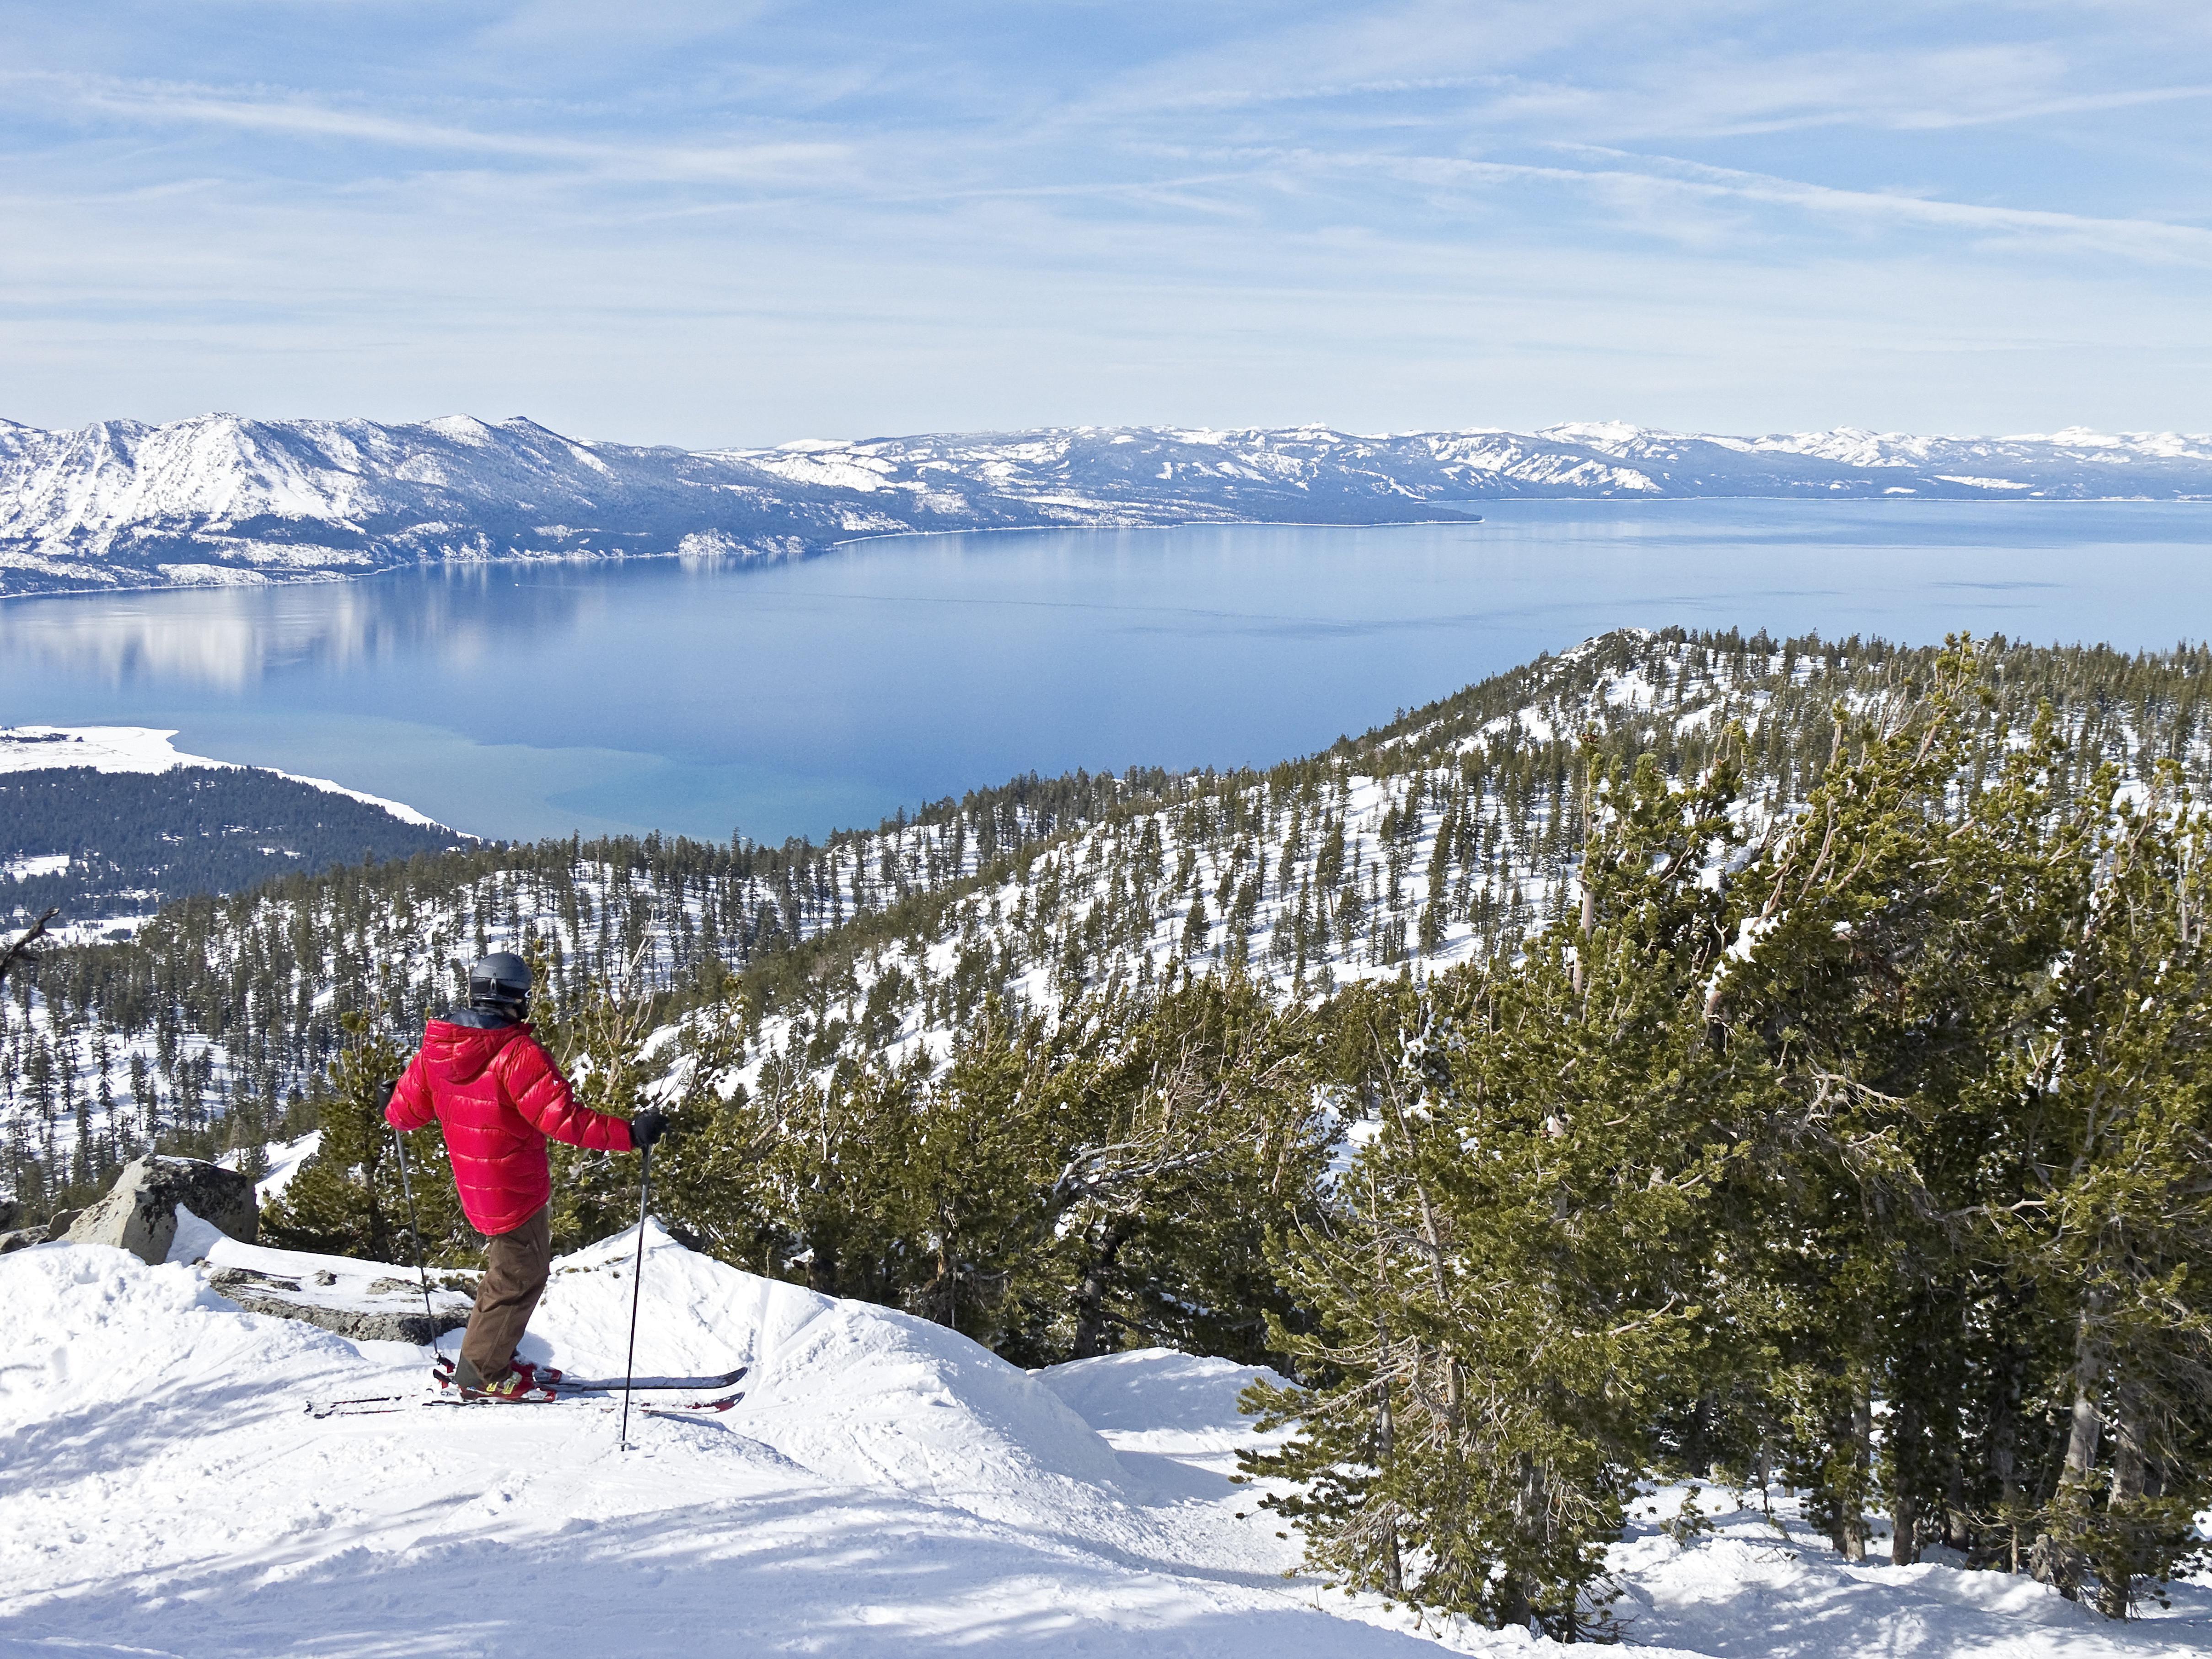 ski resorts in northern california and nevada